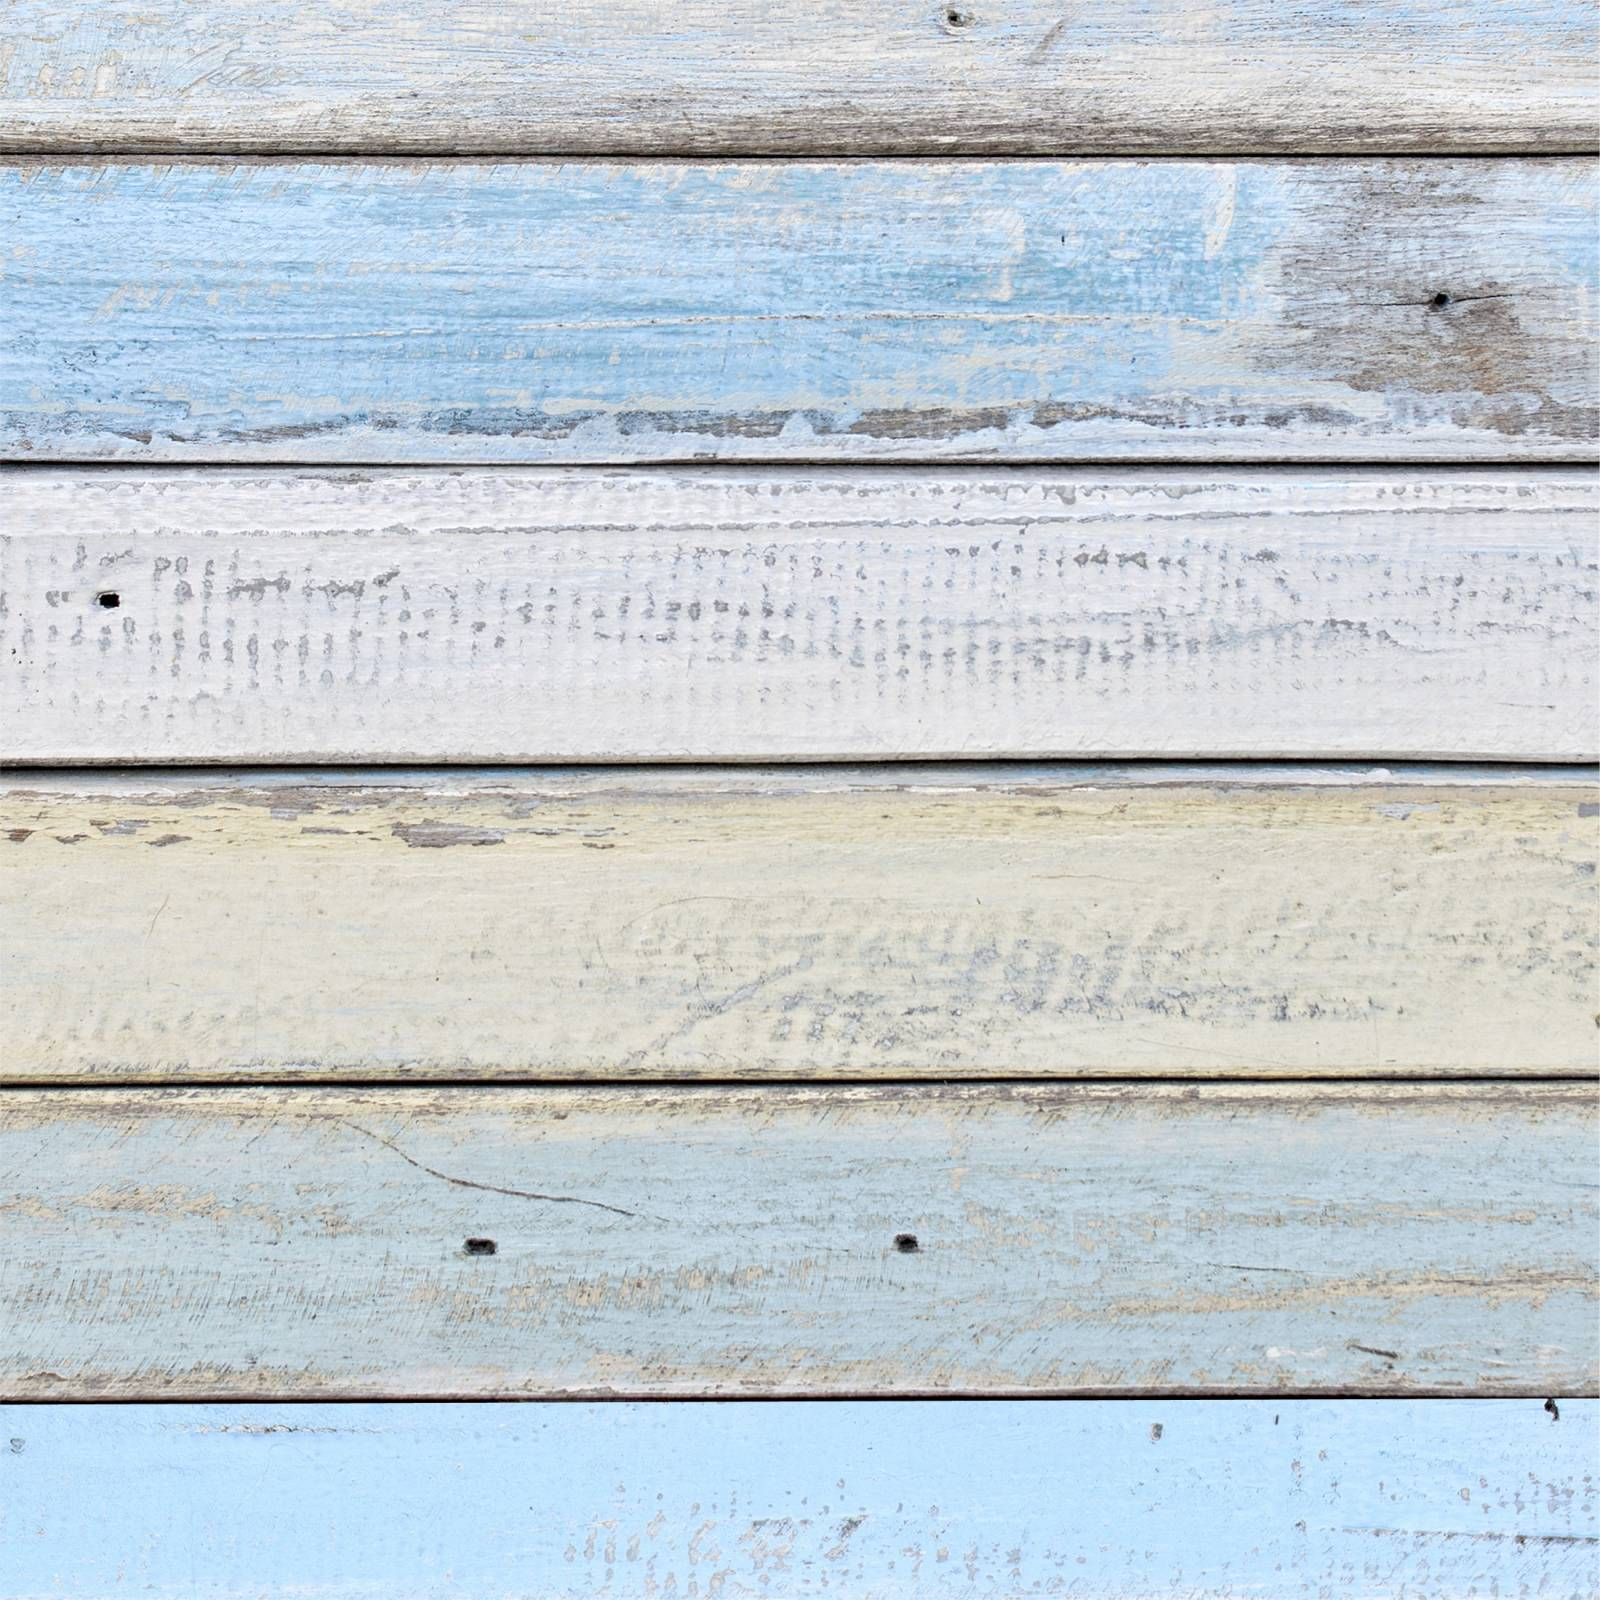 Papel de Parede Adesivo Madeira Azul | Adesivo Vinilico imagem 1